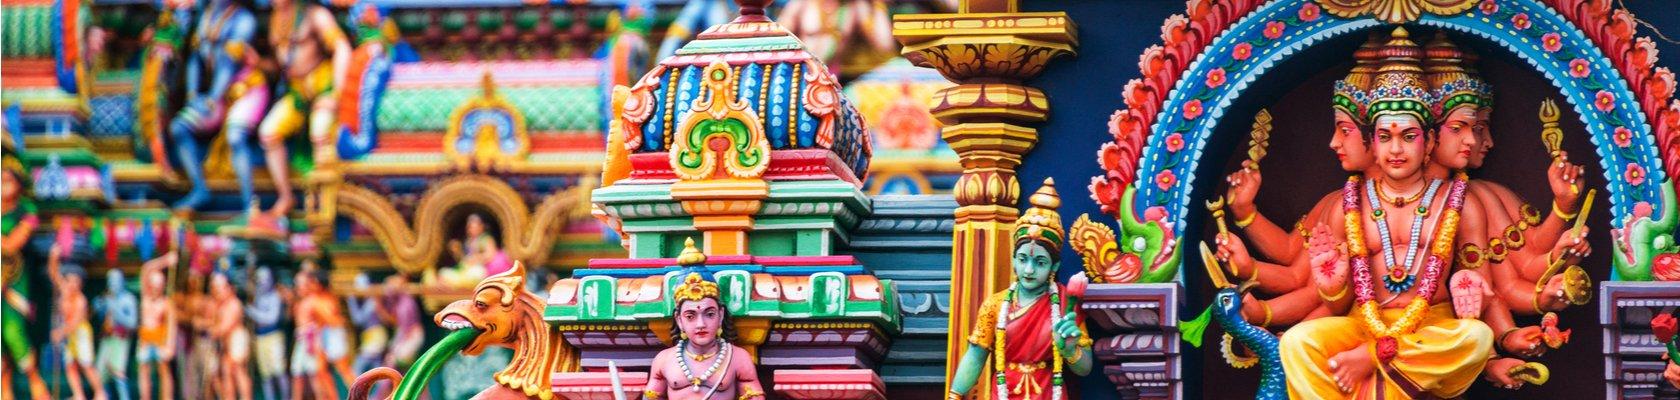 Kleurrijke tempels in Chennai